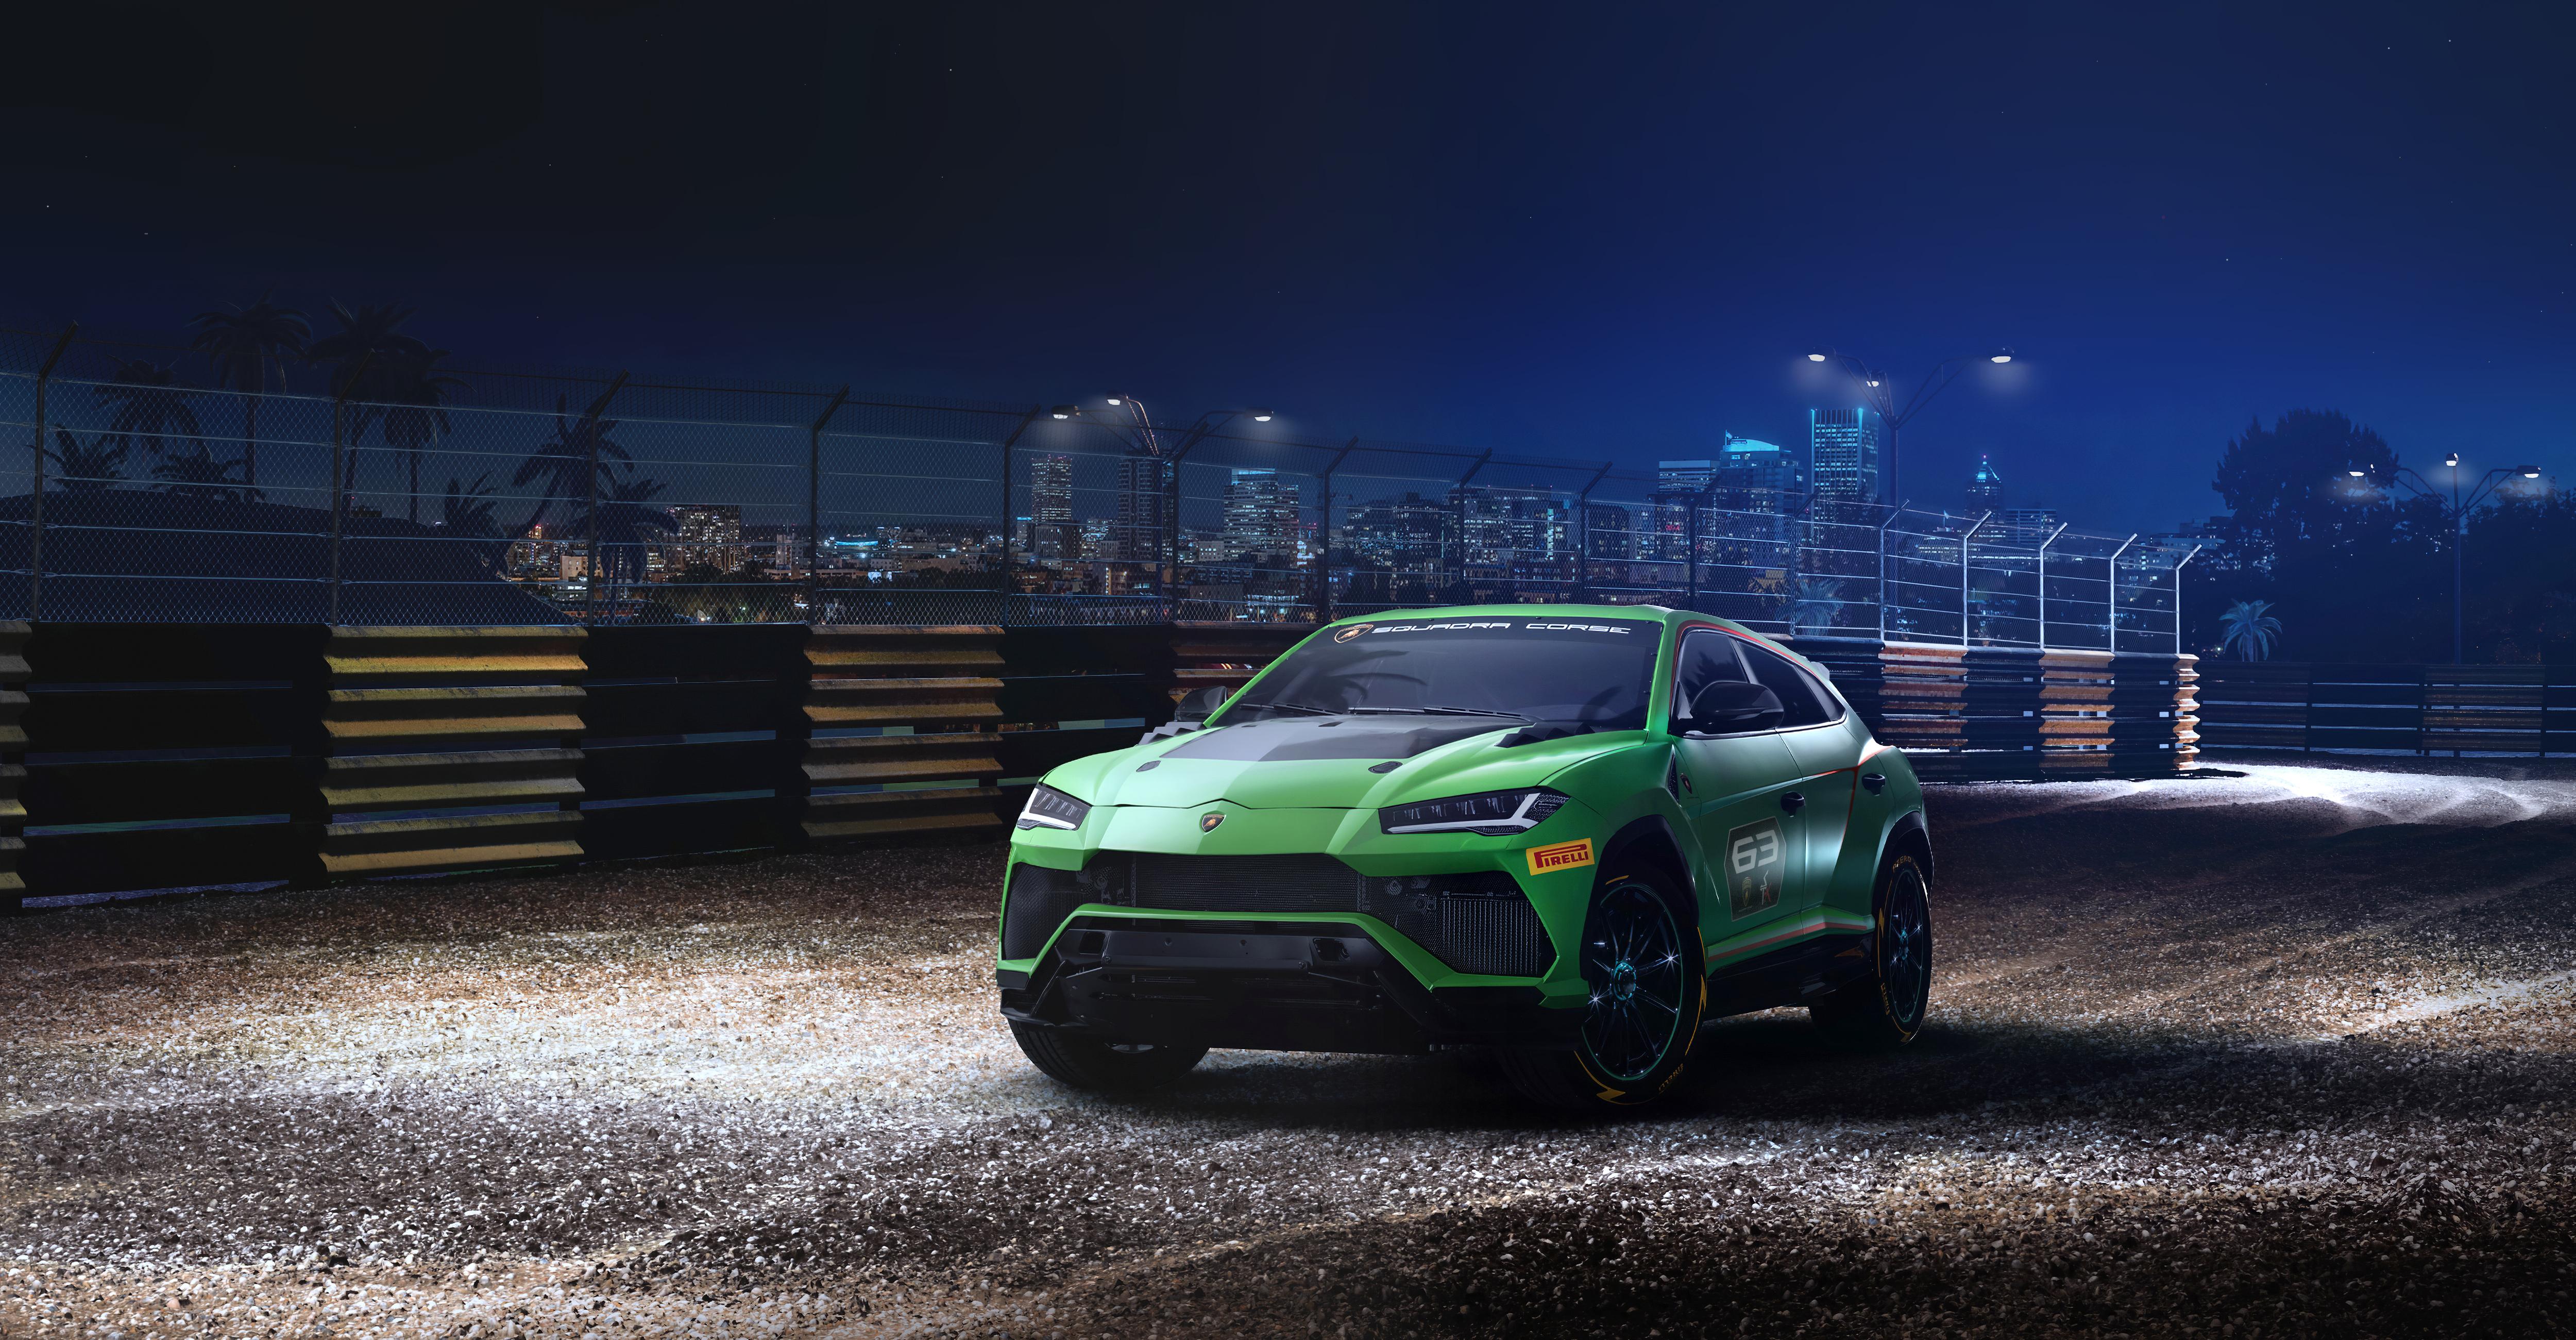 Wallpaper Lamborghini Urus Lamborghini Urus St X Concept